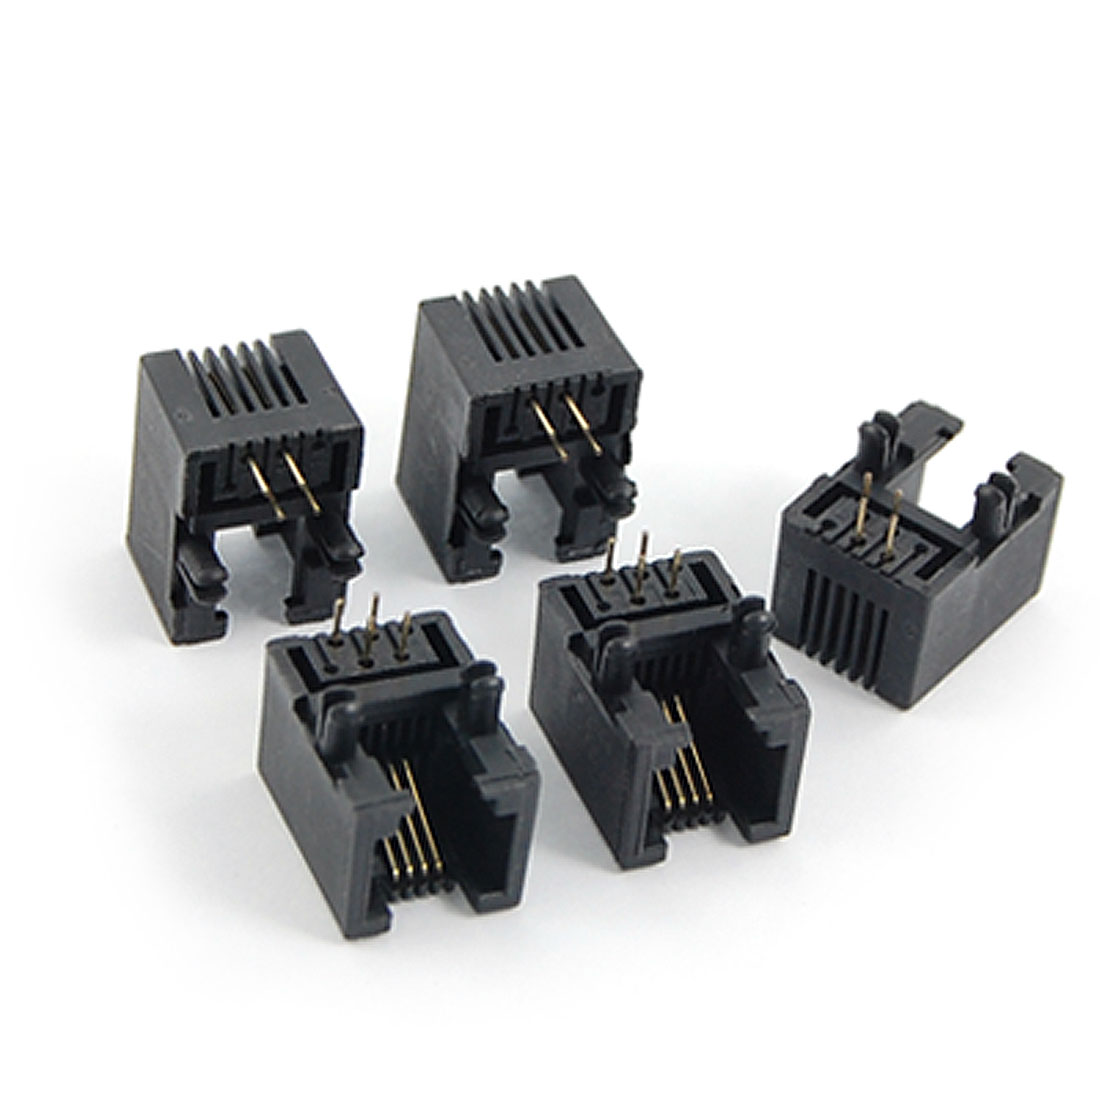 6P4C RJ11 Telephone Modular Jack PCB Contectors 5 Pcs